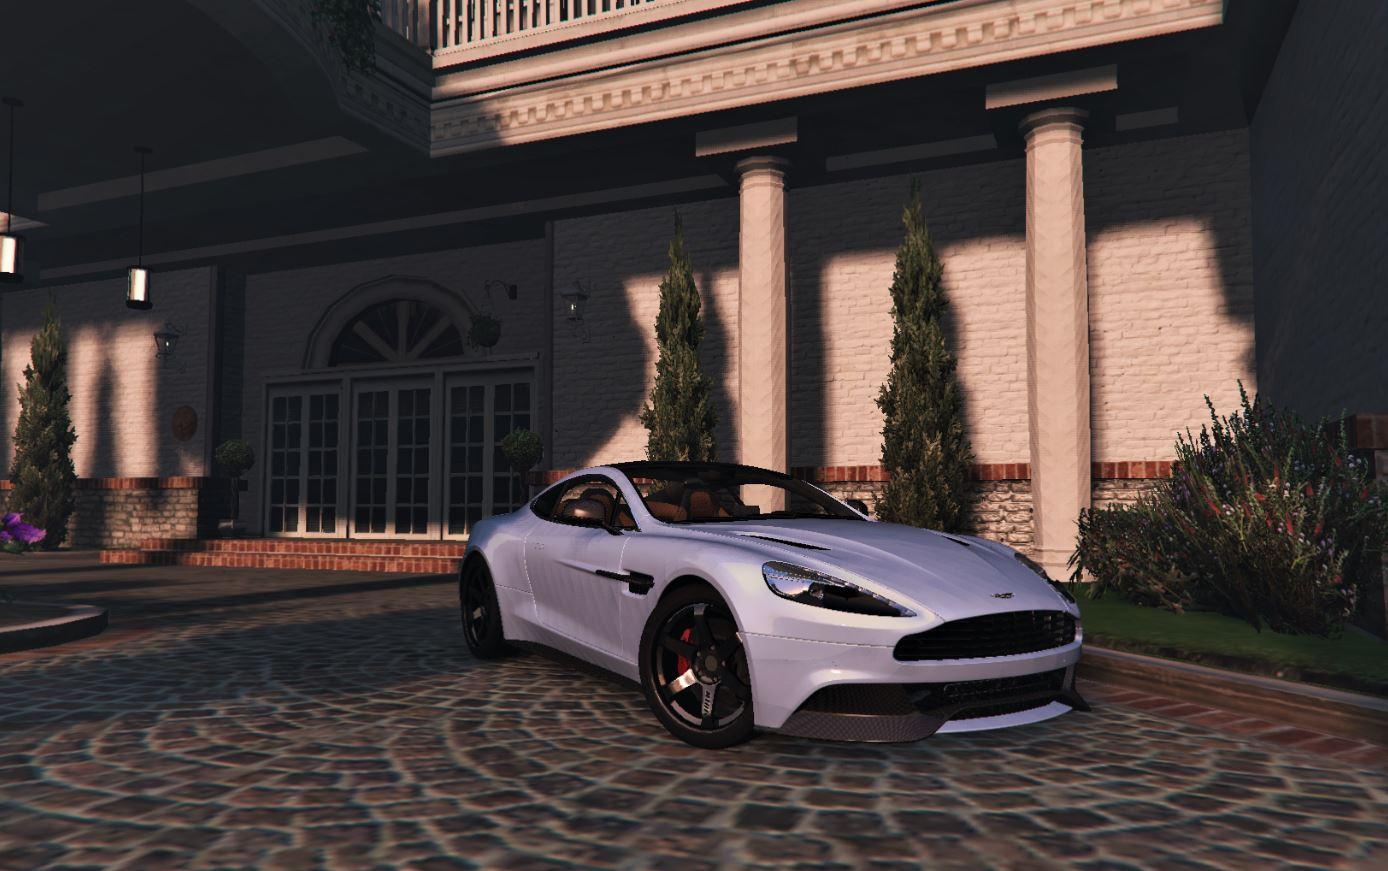 2013 Aston Martin Vanquish Real Life Handling Gta5 Mods Com